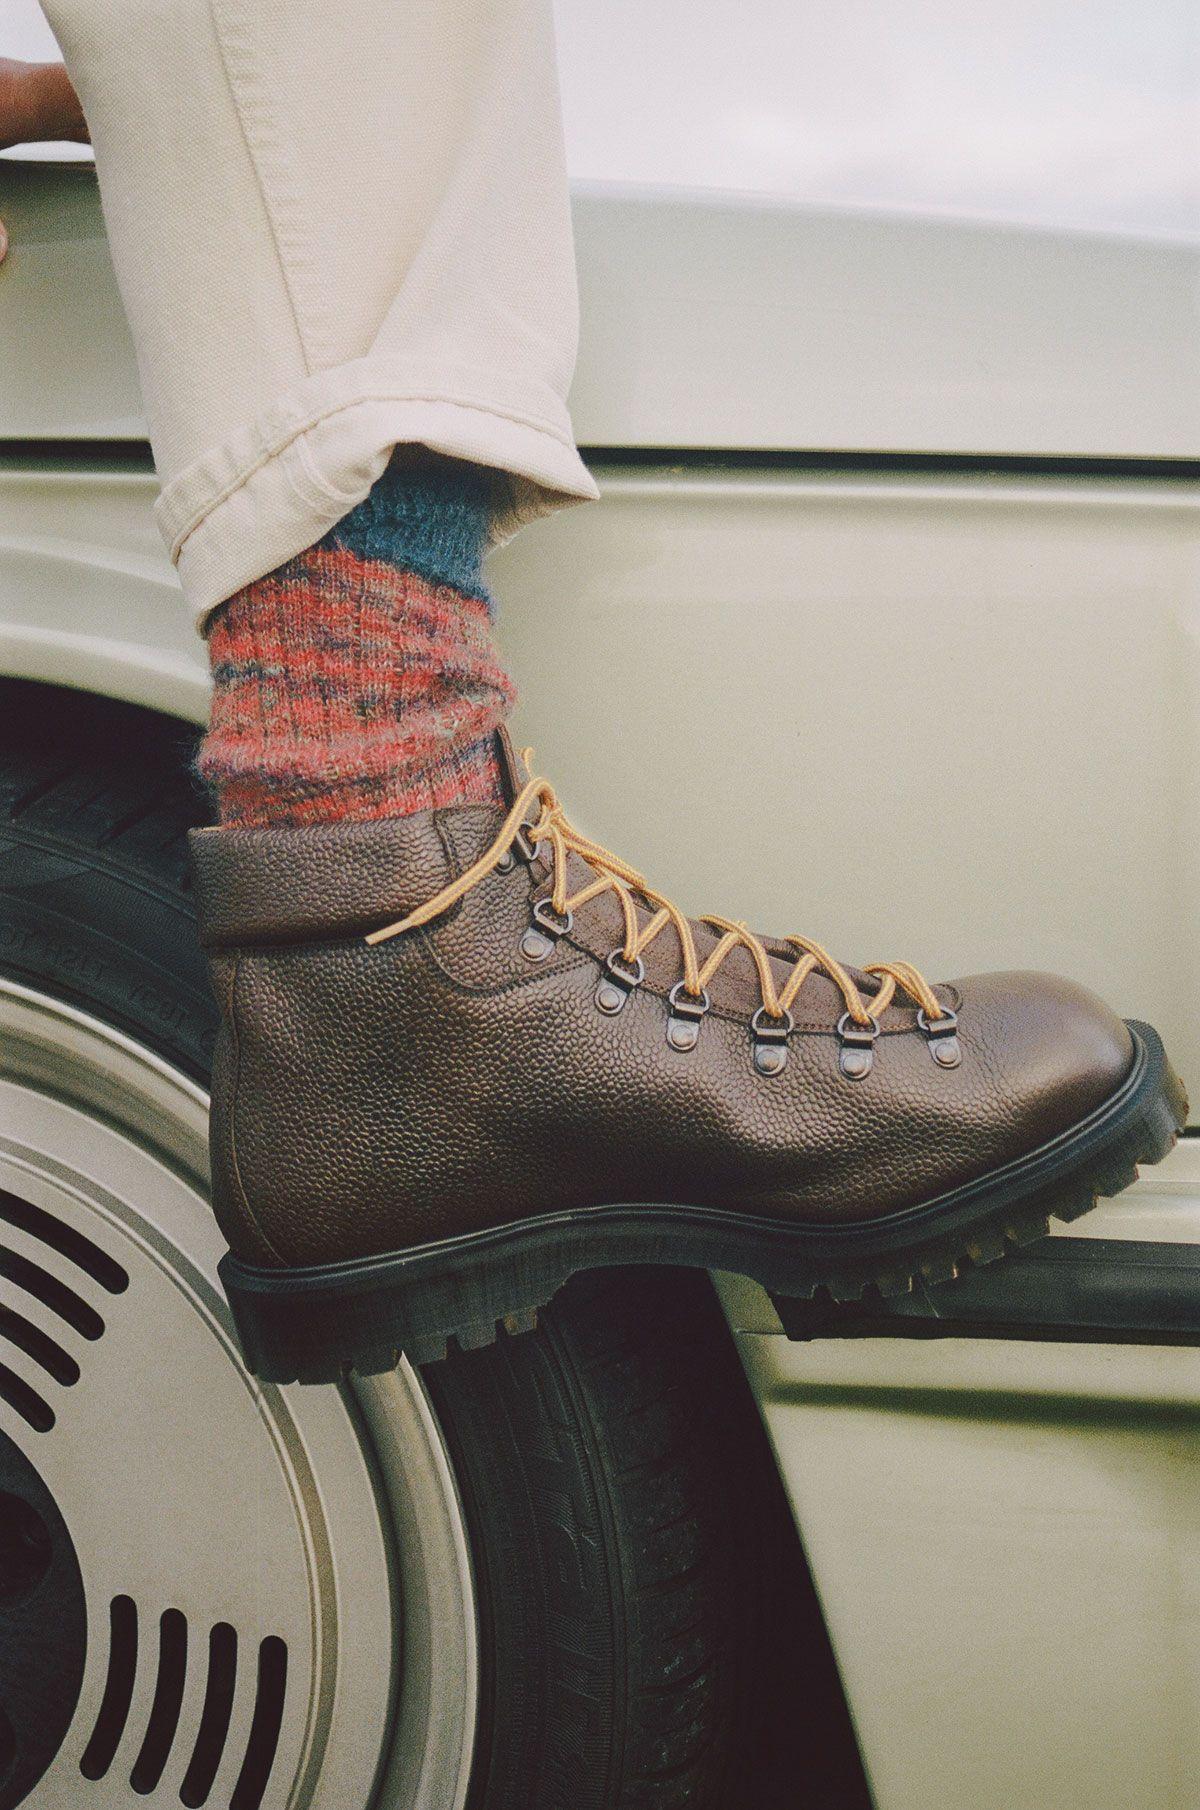 YMC x Solovair Walking Boot